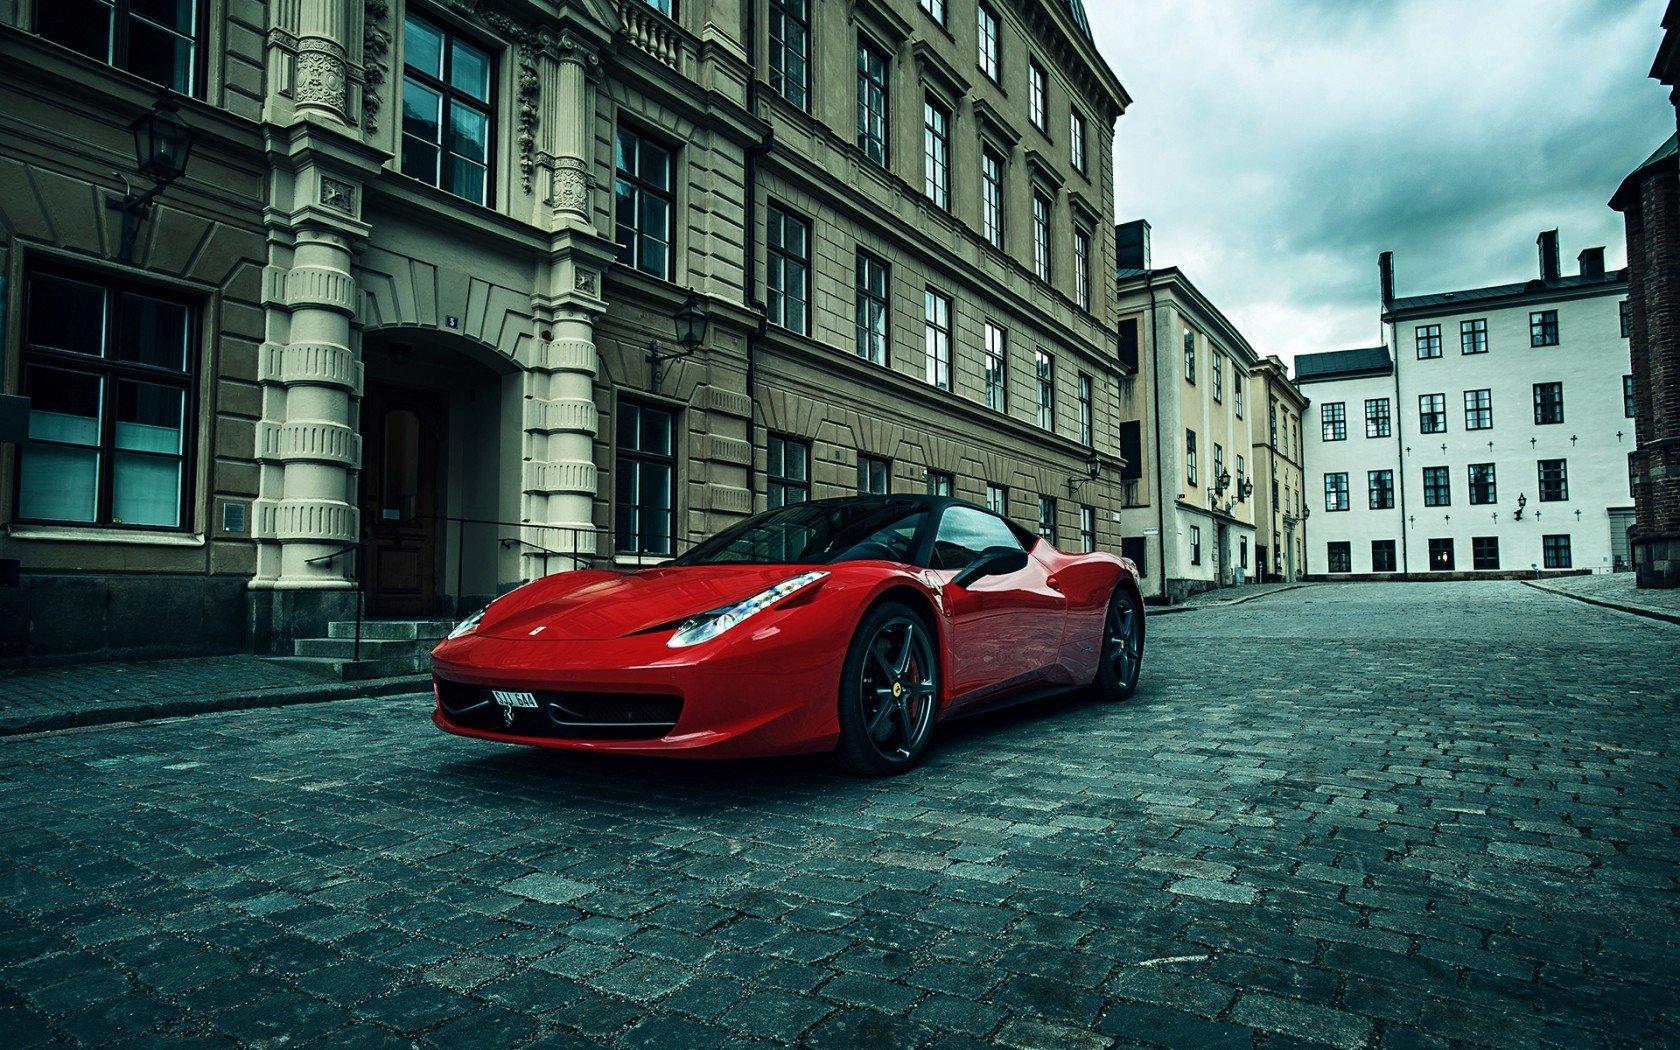 Streets Cars Engines Ferrari Wheels Red Cars Fast Italian Cars Auto Wallpaper X  Wallpaperup